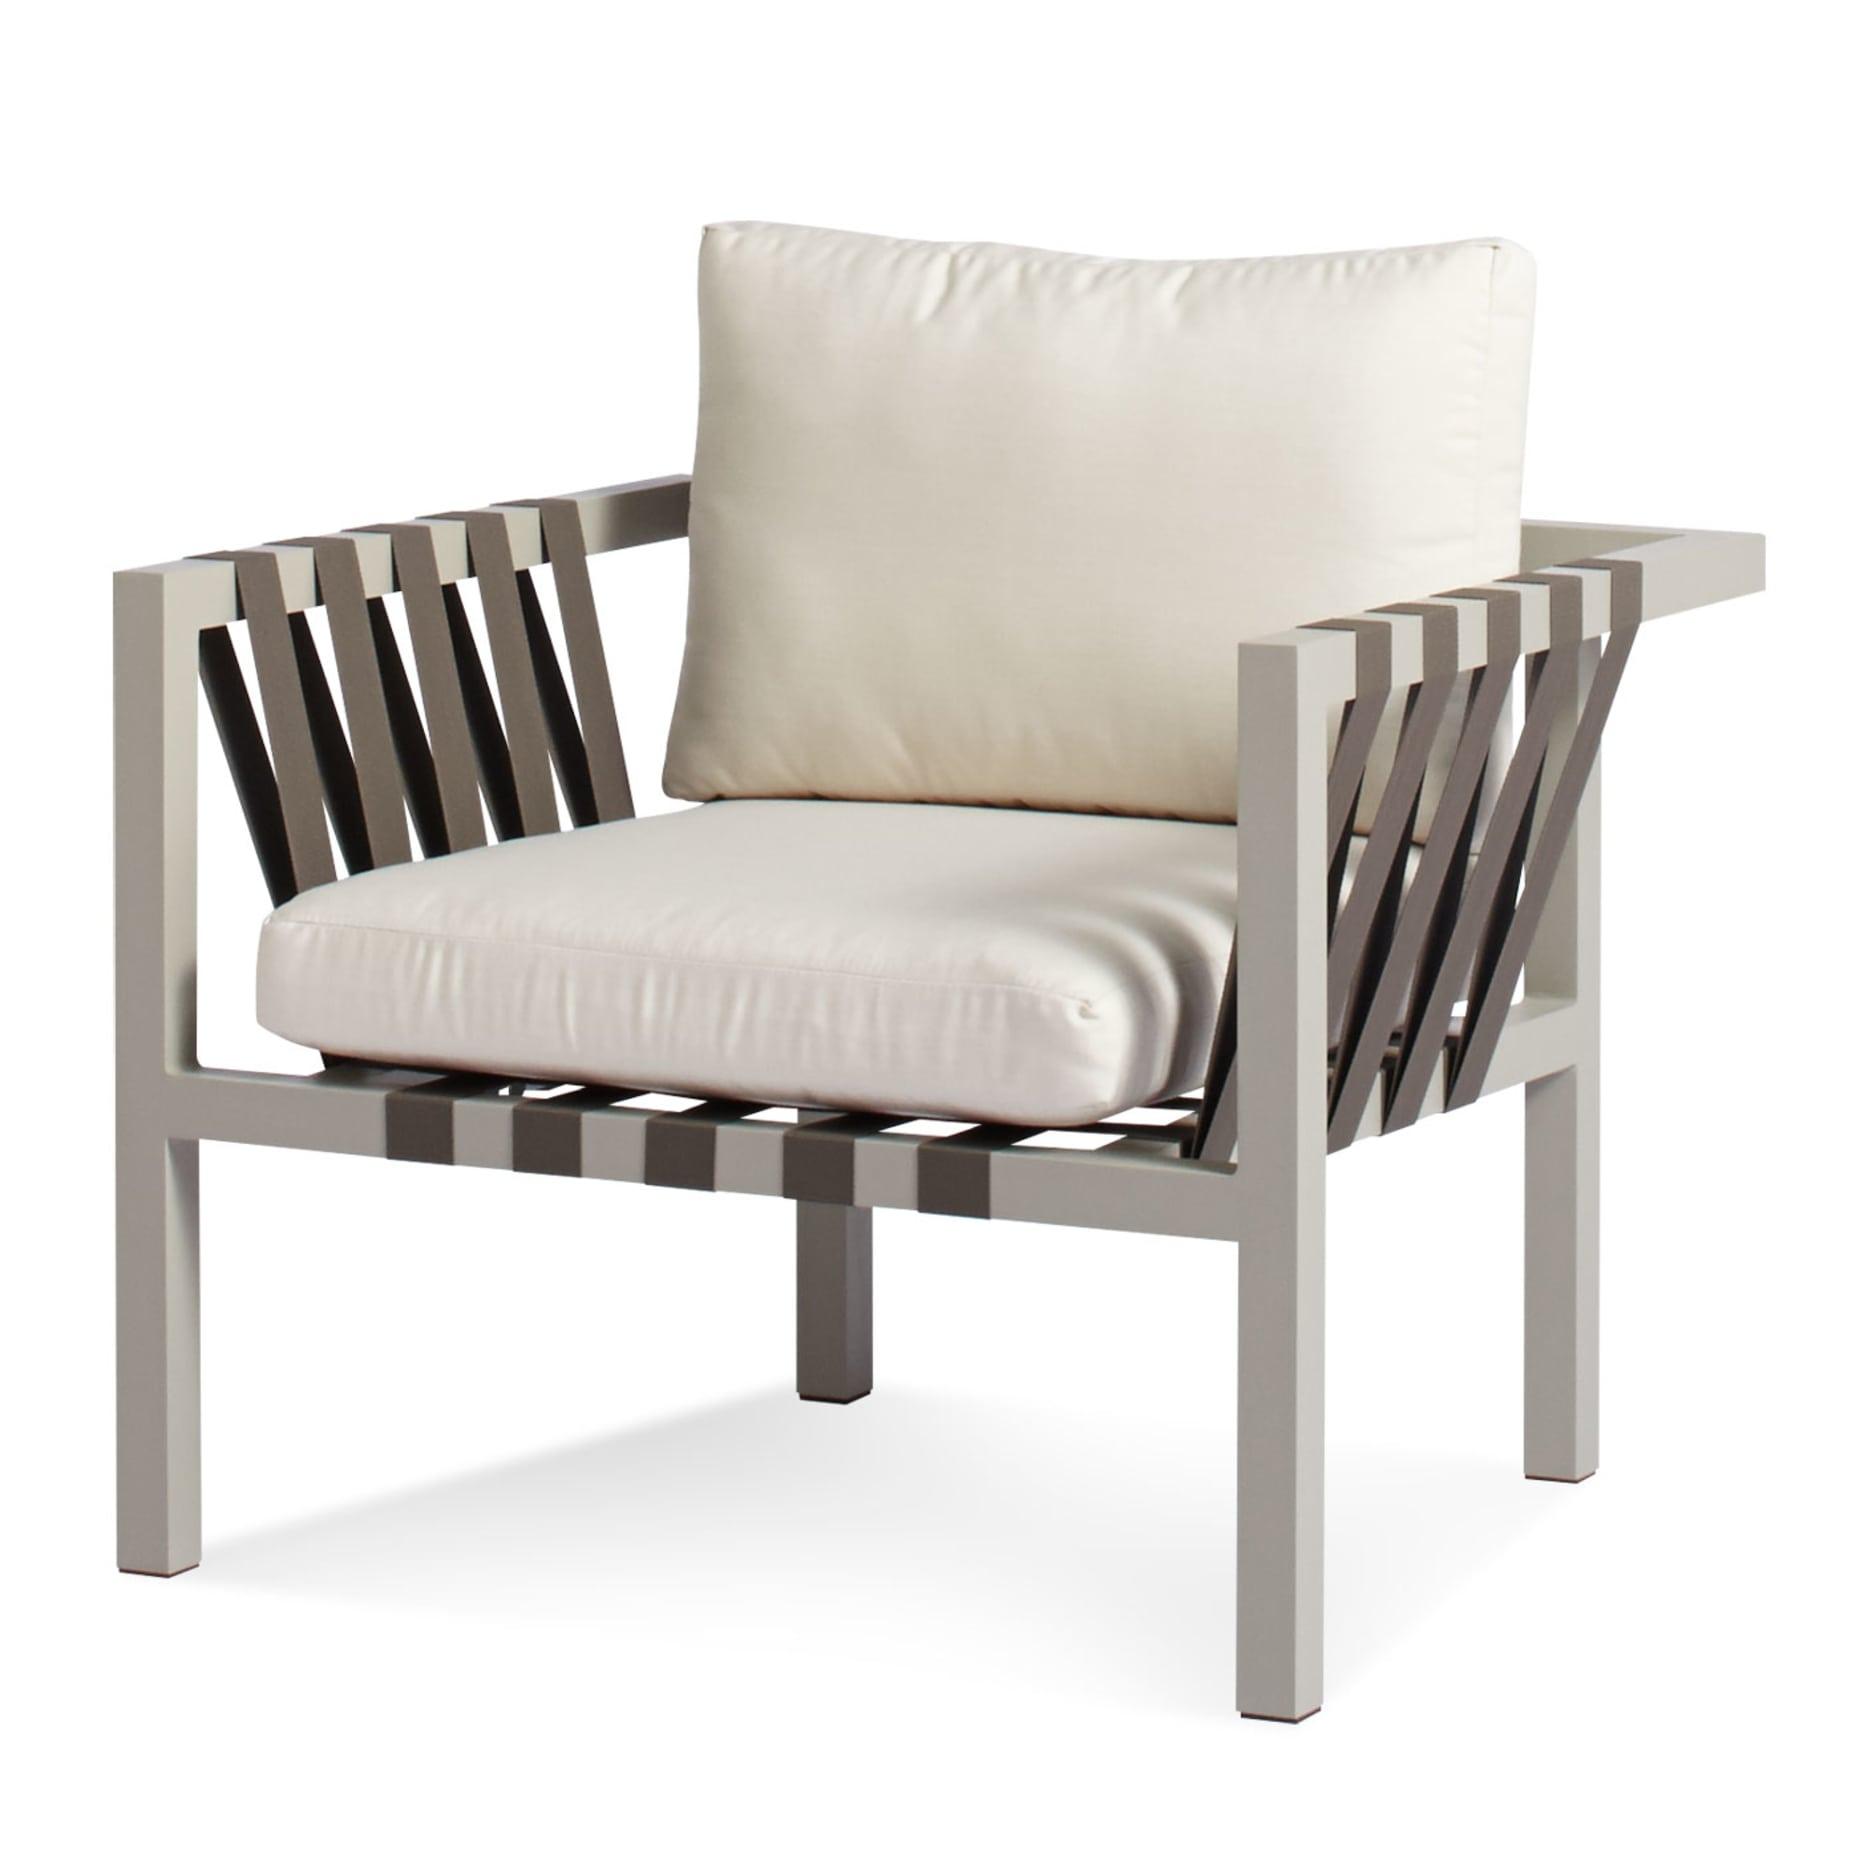 jibe modern outdoor lounge chair